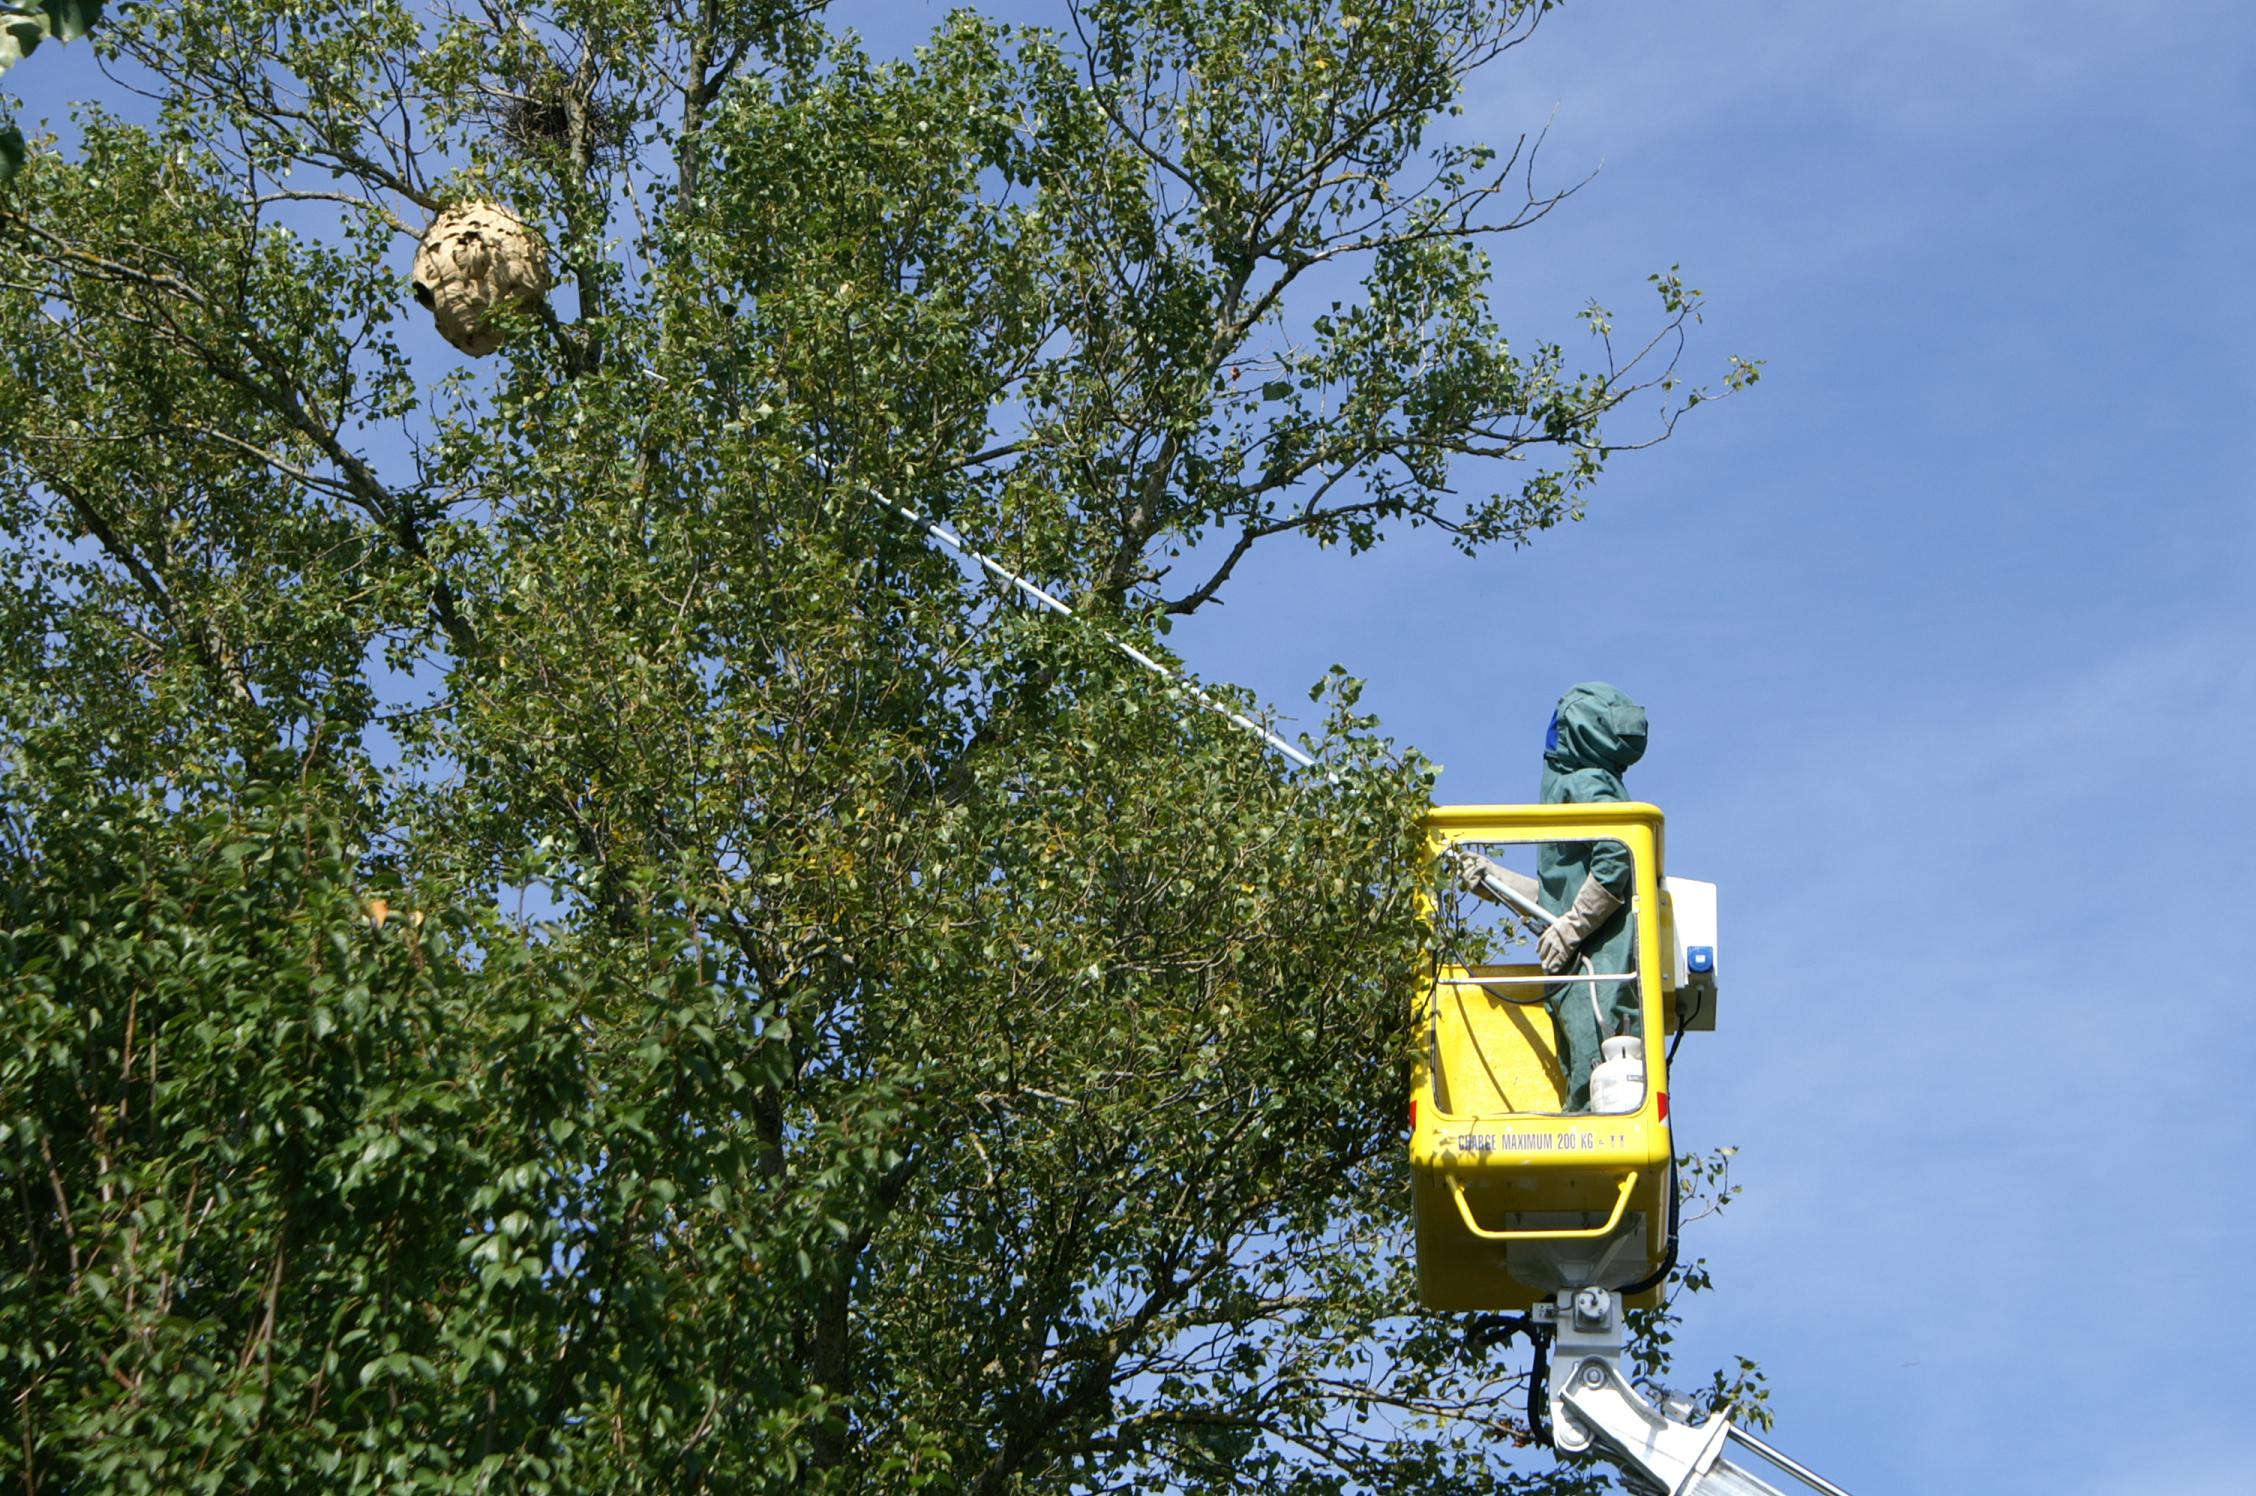 Les feuilles tombent, les nids de frelons asiatiques apparaissent!